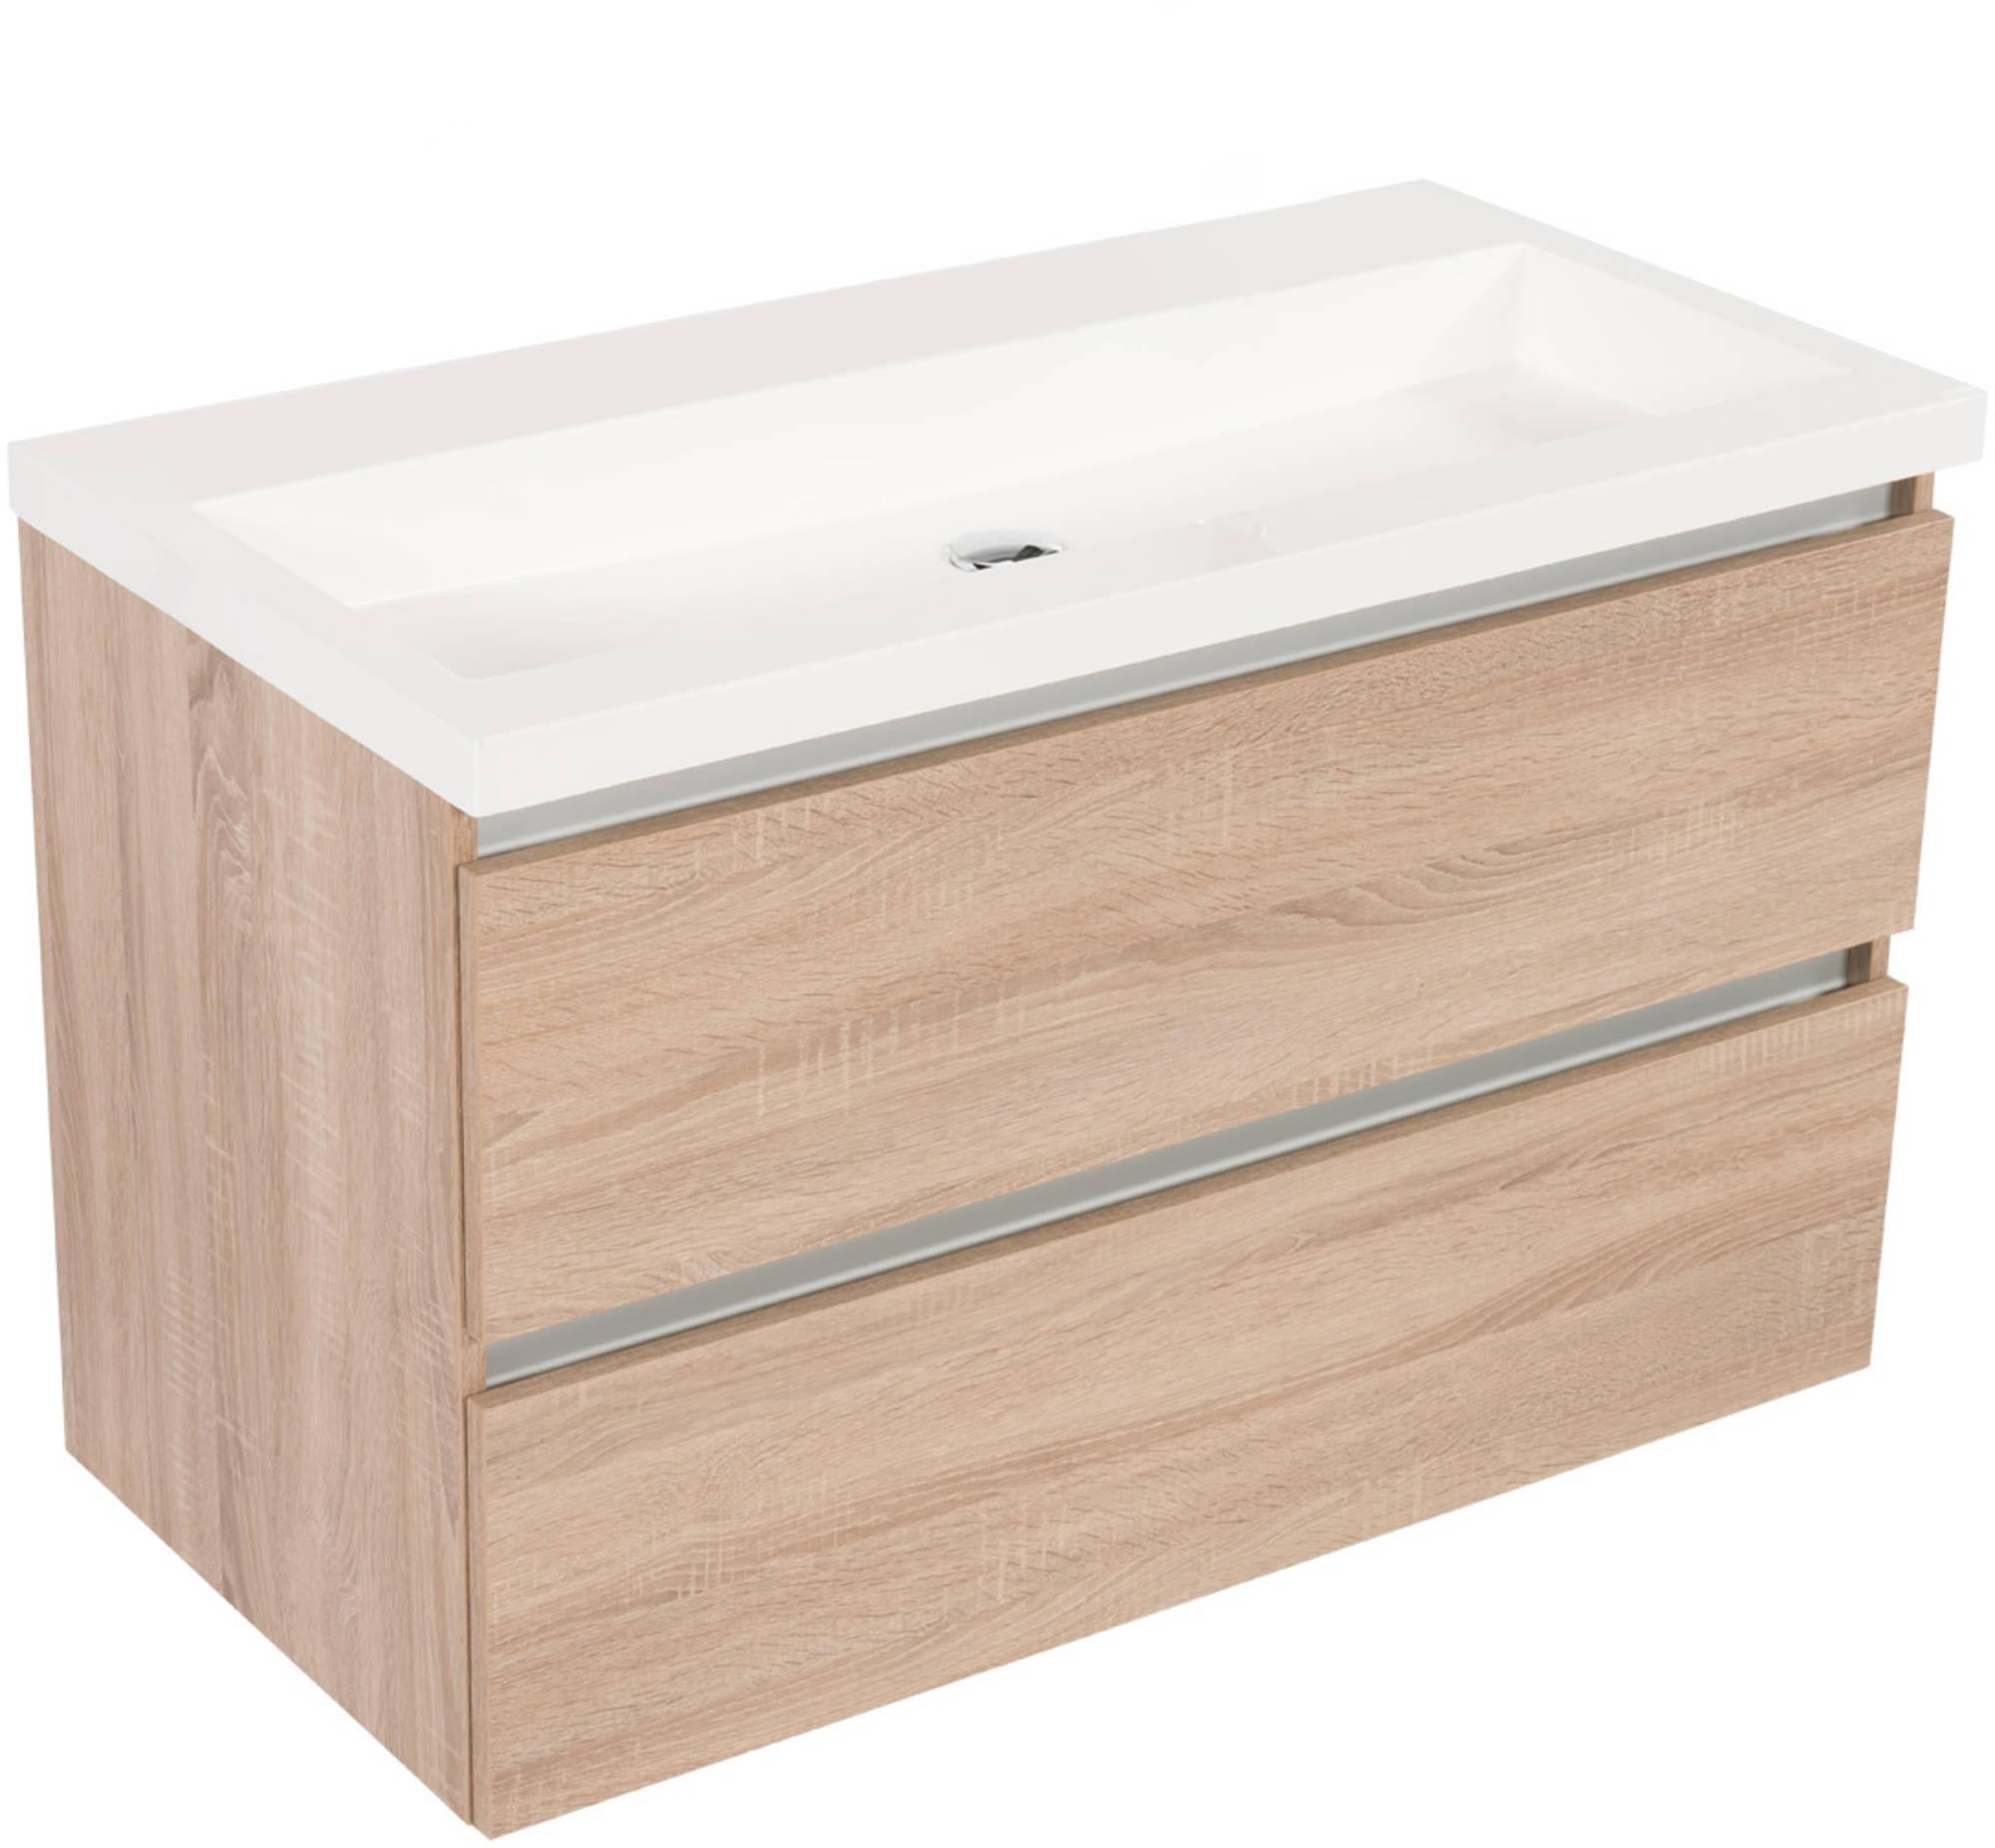 Saniselect Guarda meubelset 2 lades met mineraalmarmere wastafel greeploos 100cm Bardolino Eiken Zon